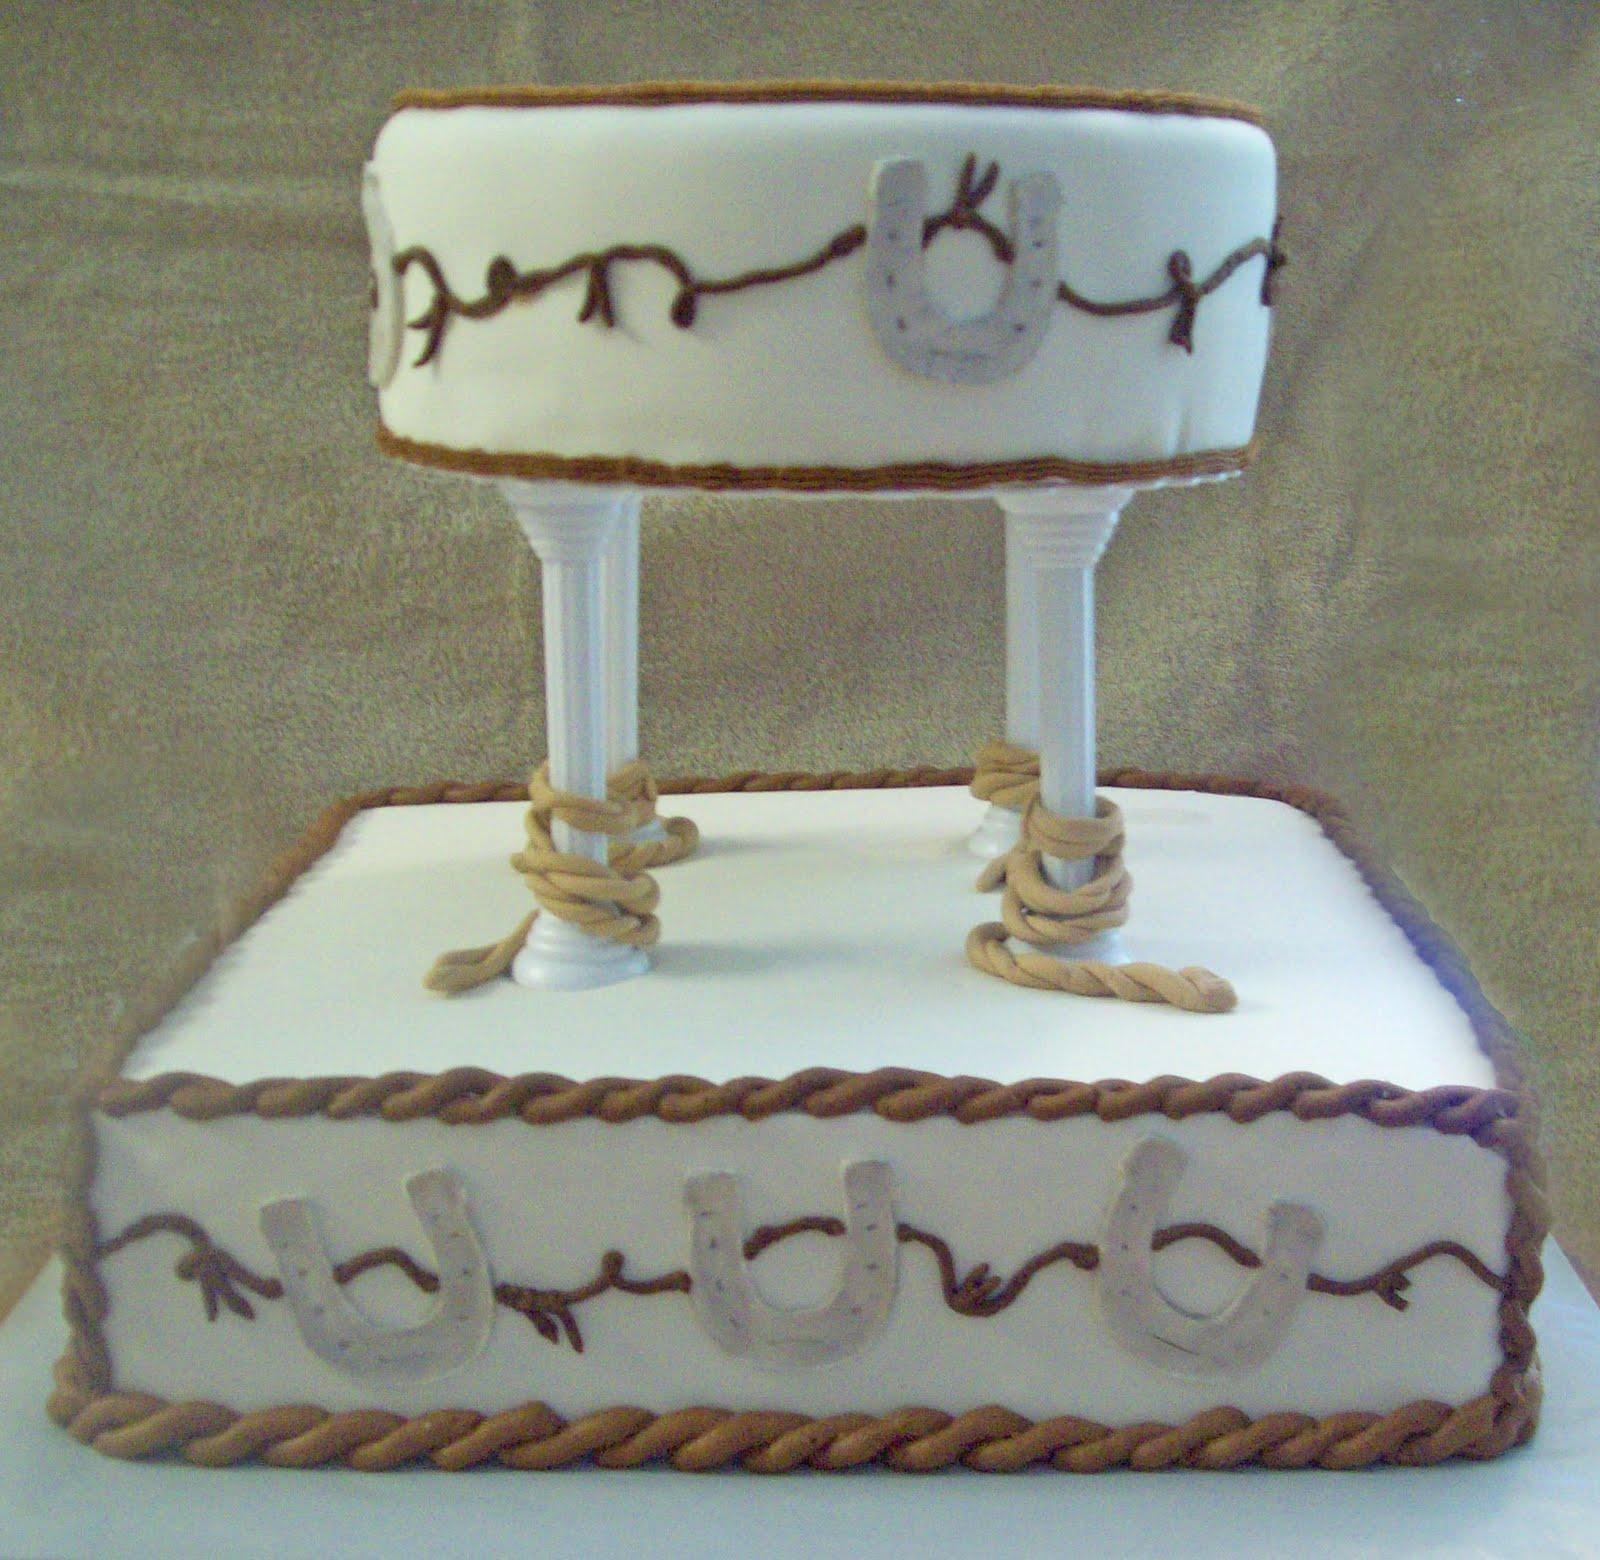 Western Wedding Cakes Viewing Gallery